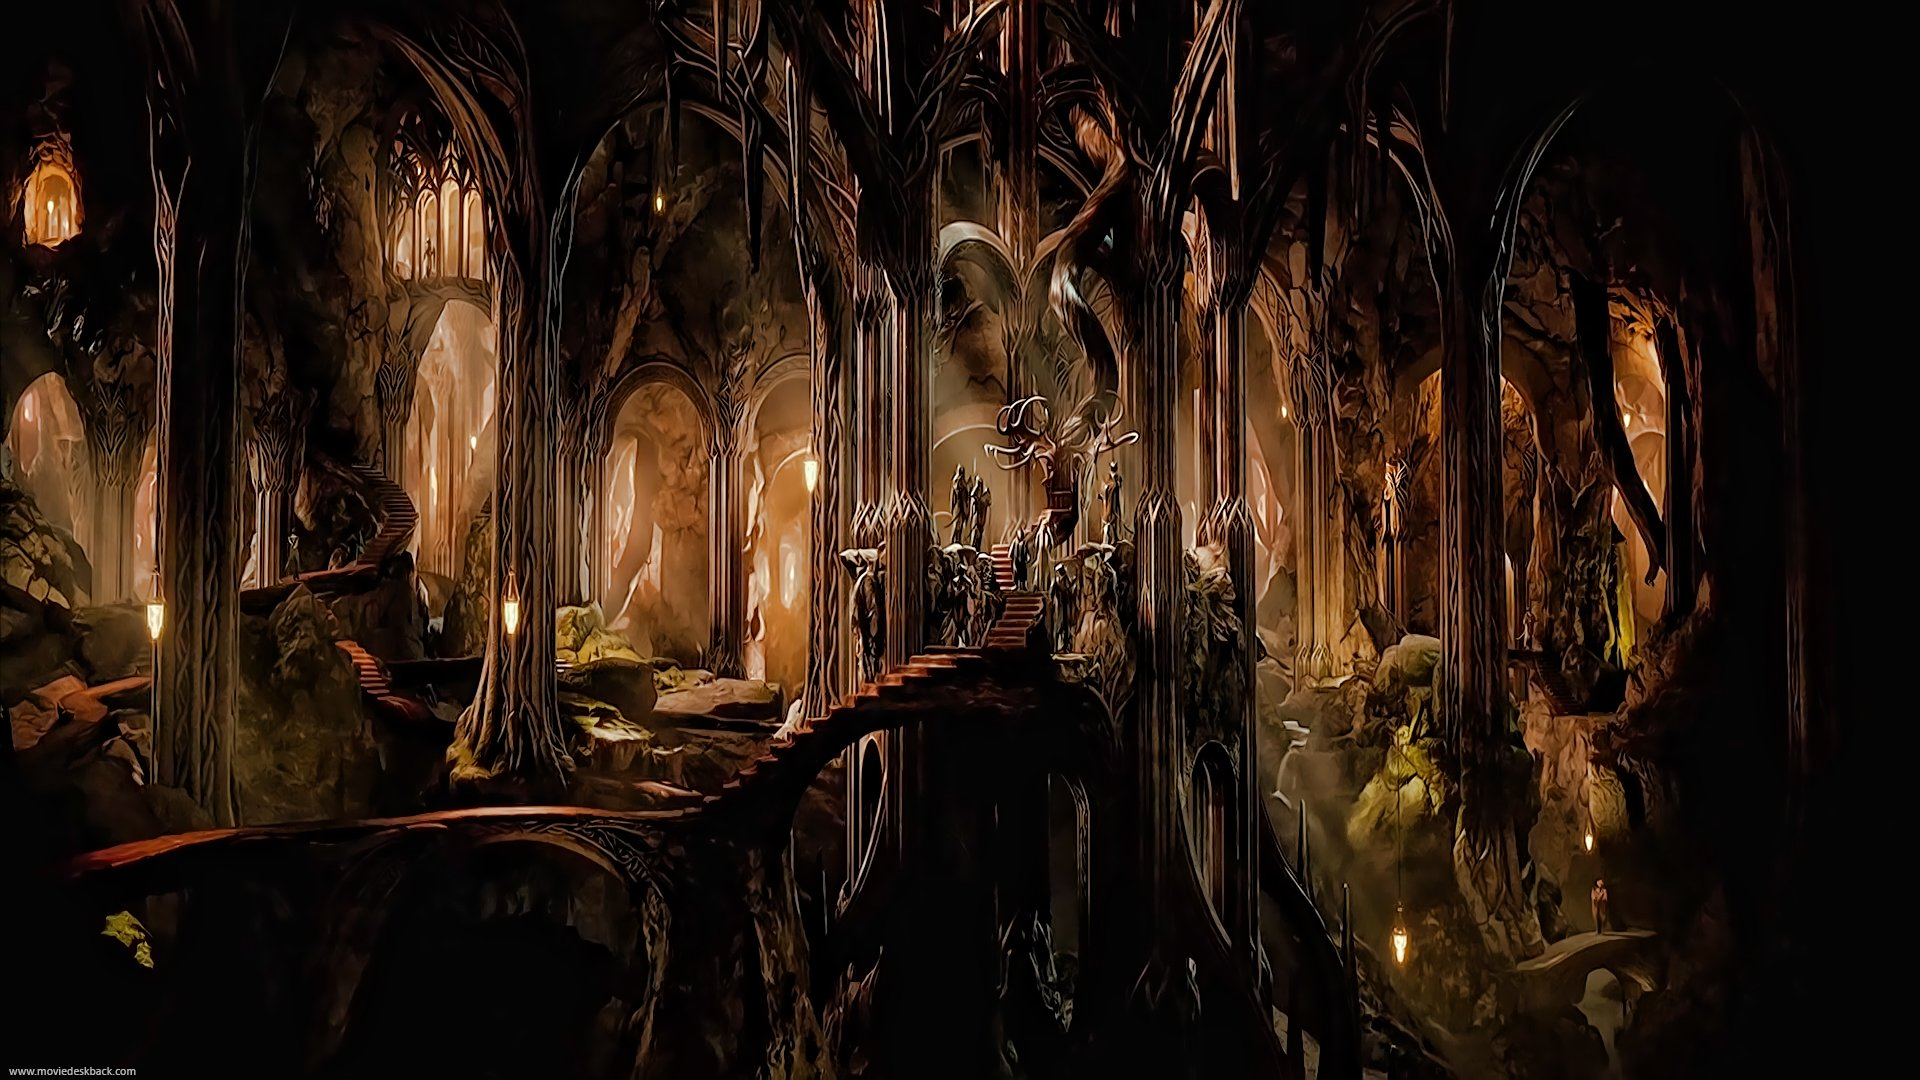 Mirkwood Wood elf Realm   Fantasy and Magical Stuff   Pinterest